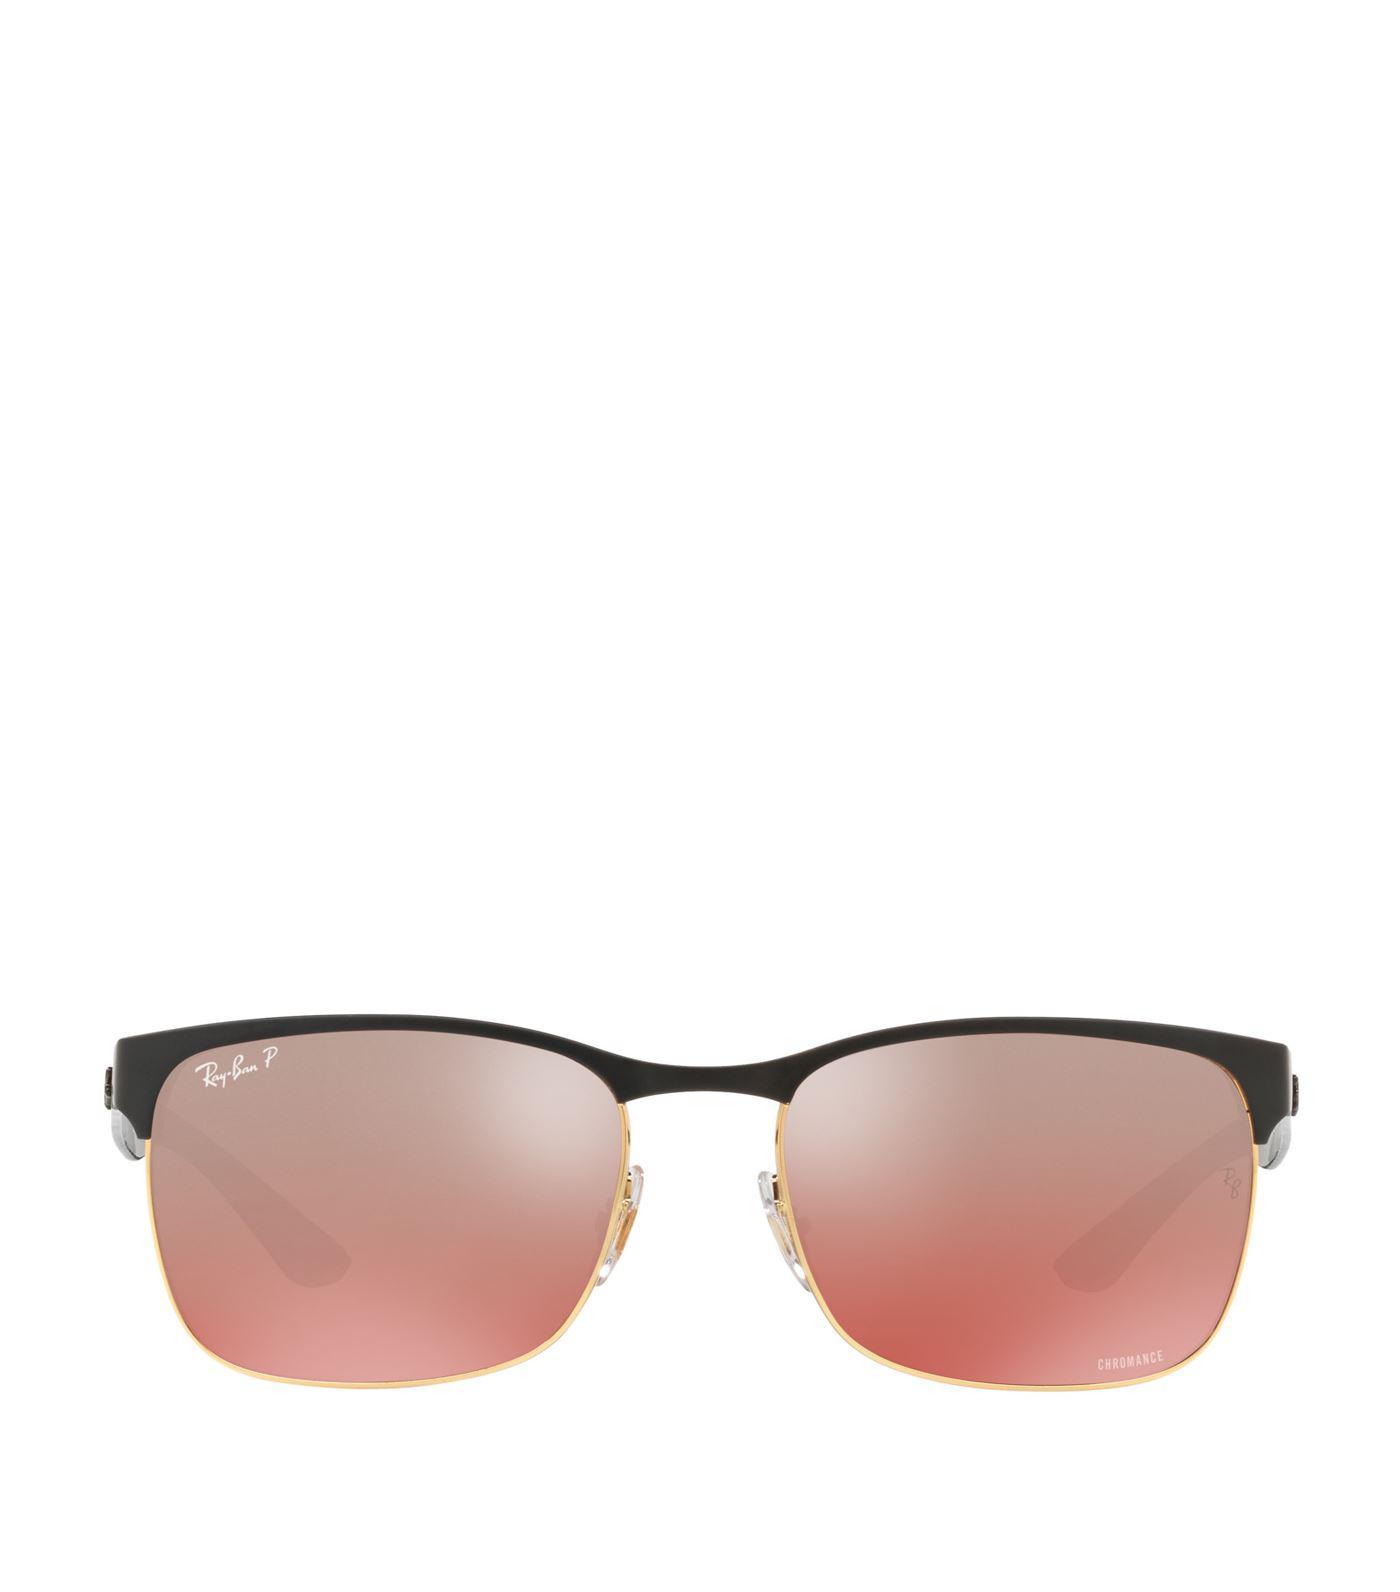 667e2da18d Ray-Ban Chromance Sunglasses in Black - Lyst